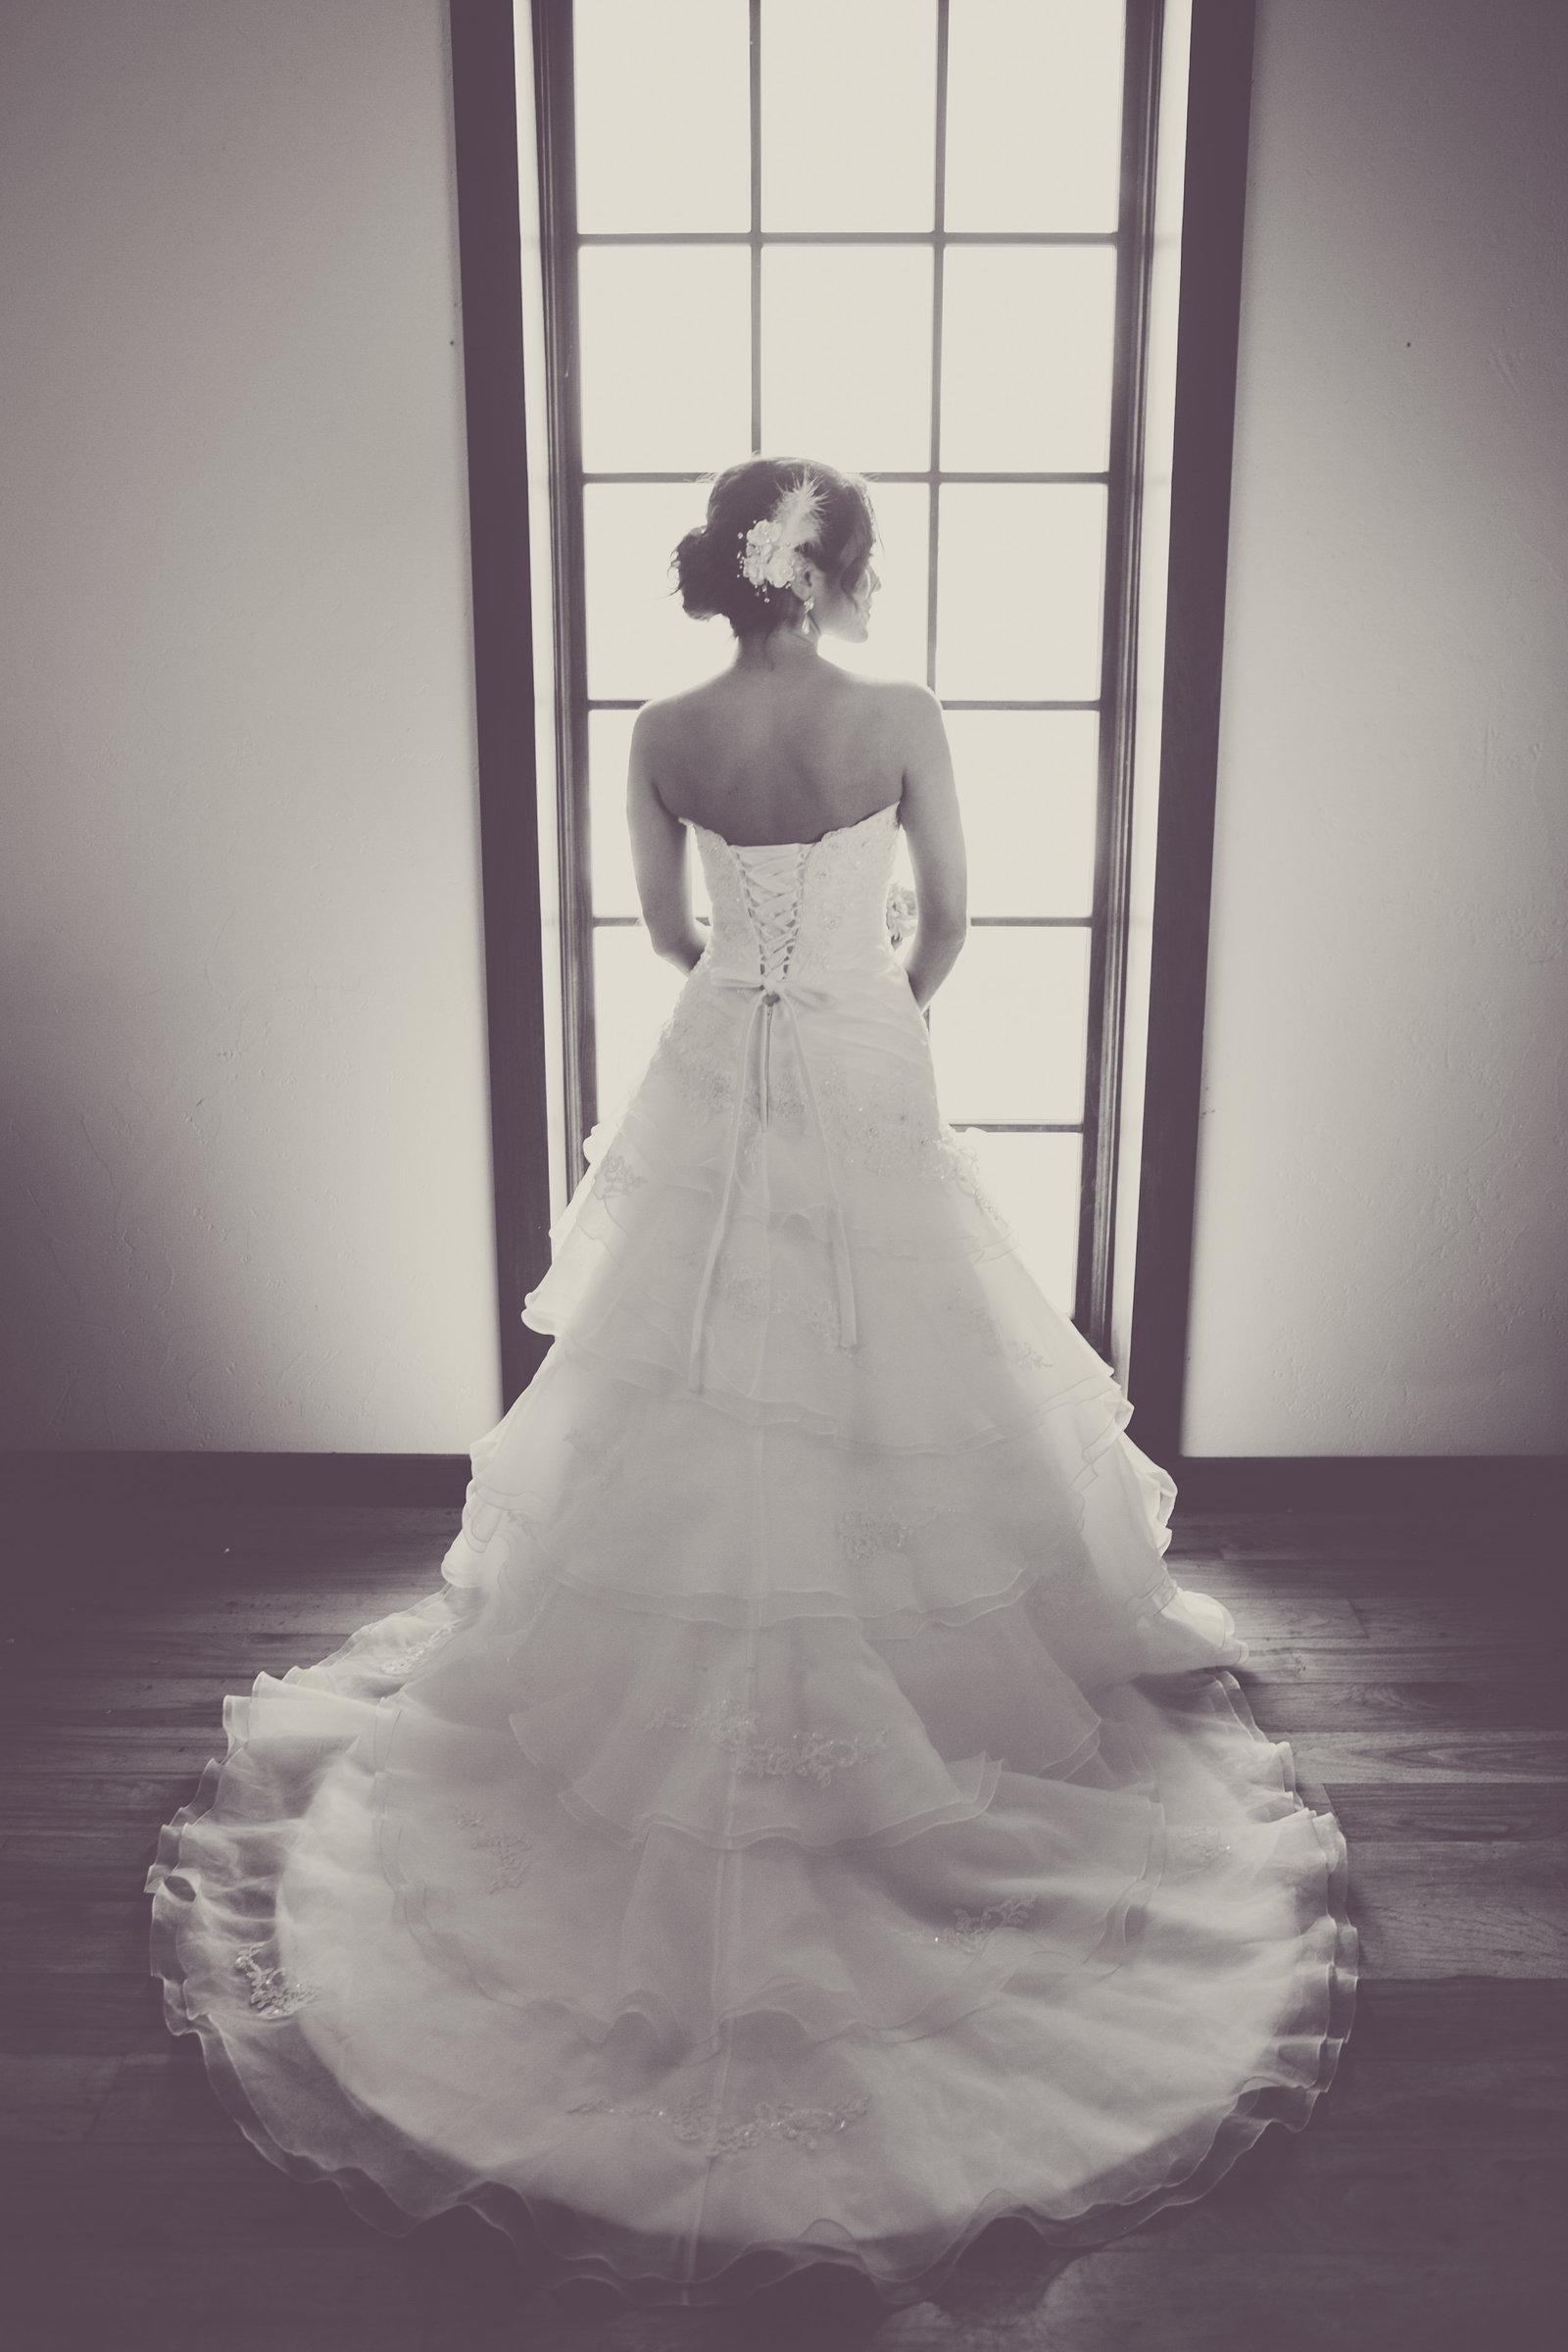 Austin Family Photographer, Tiffany Chapman, bride in window photo